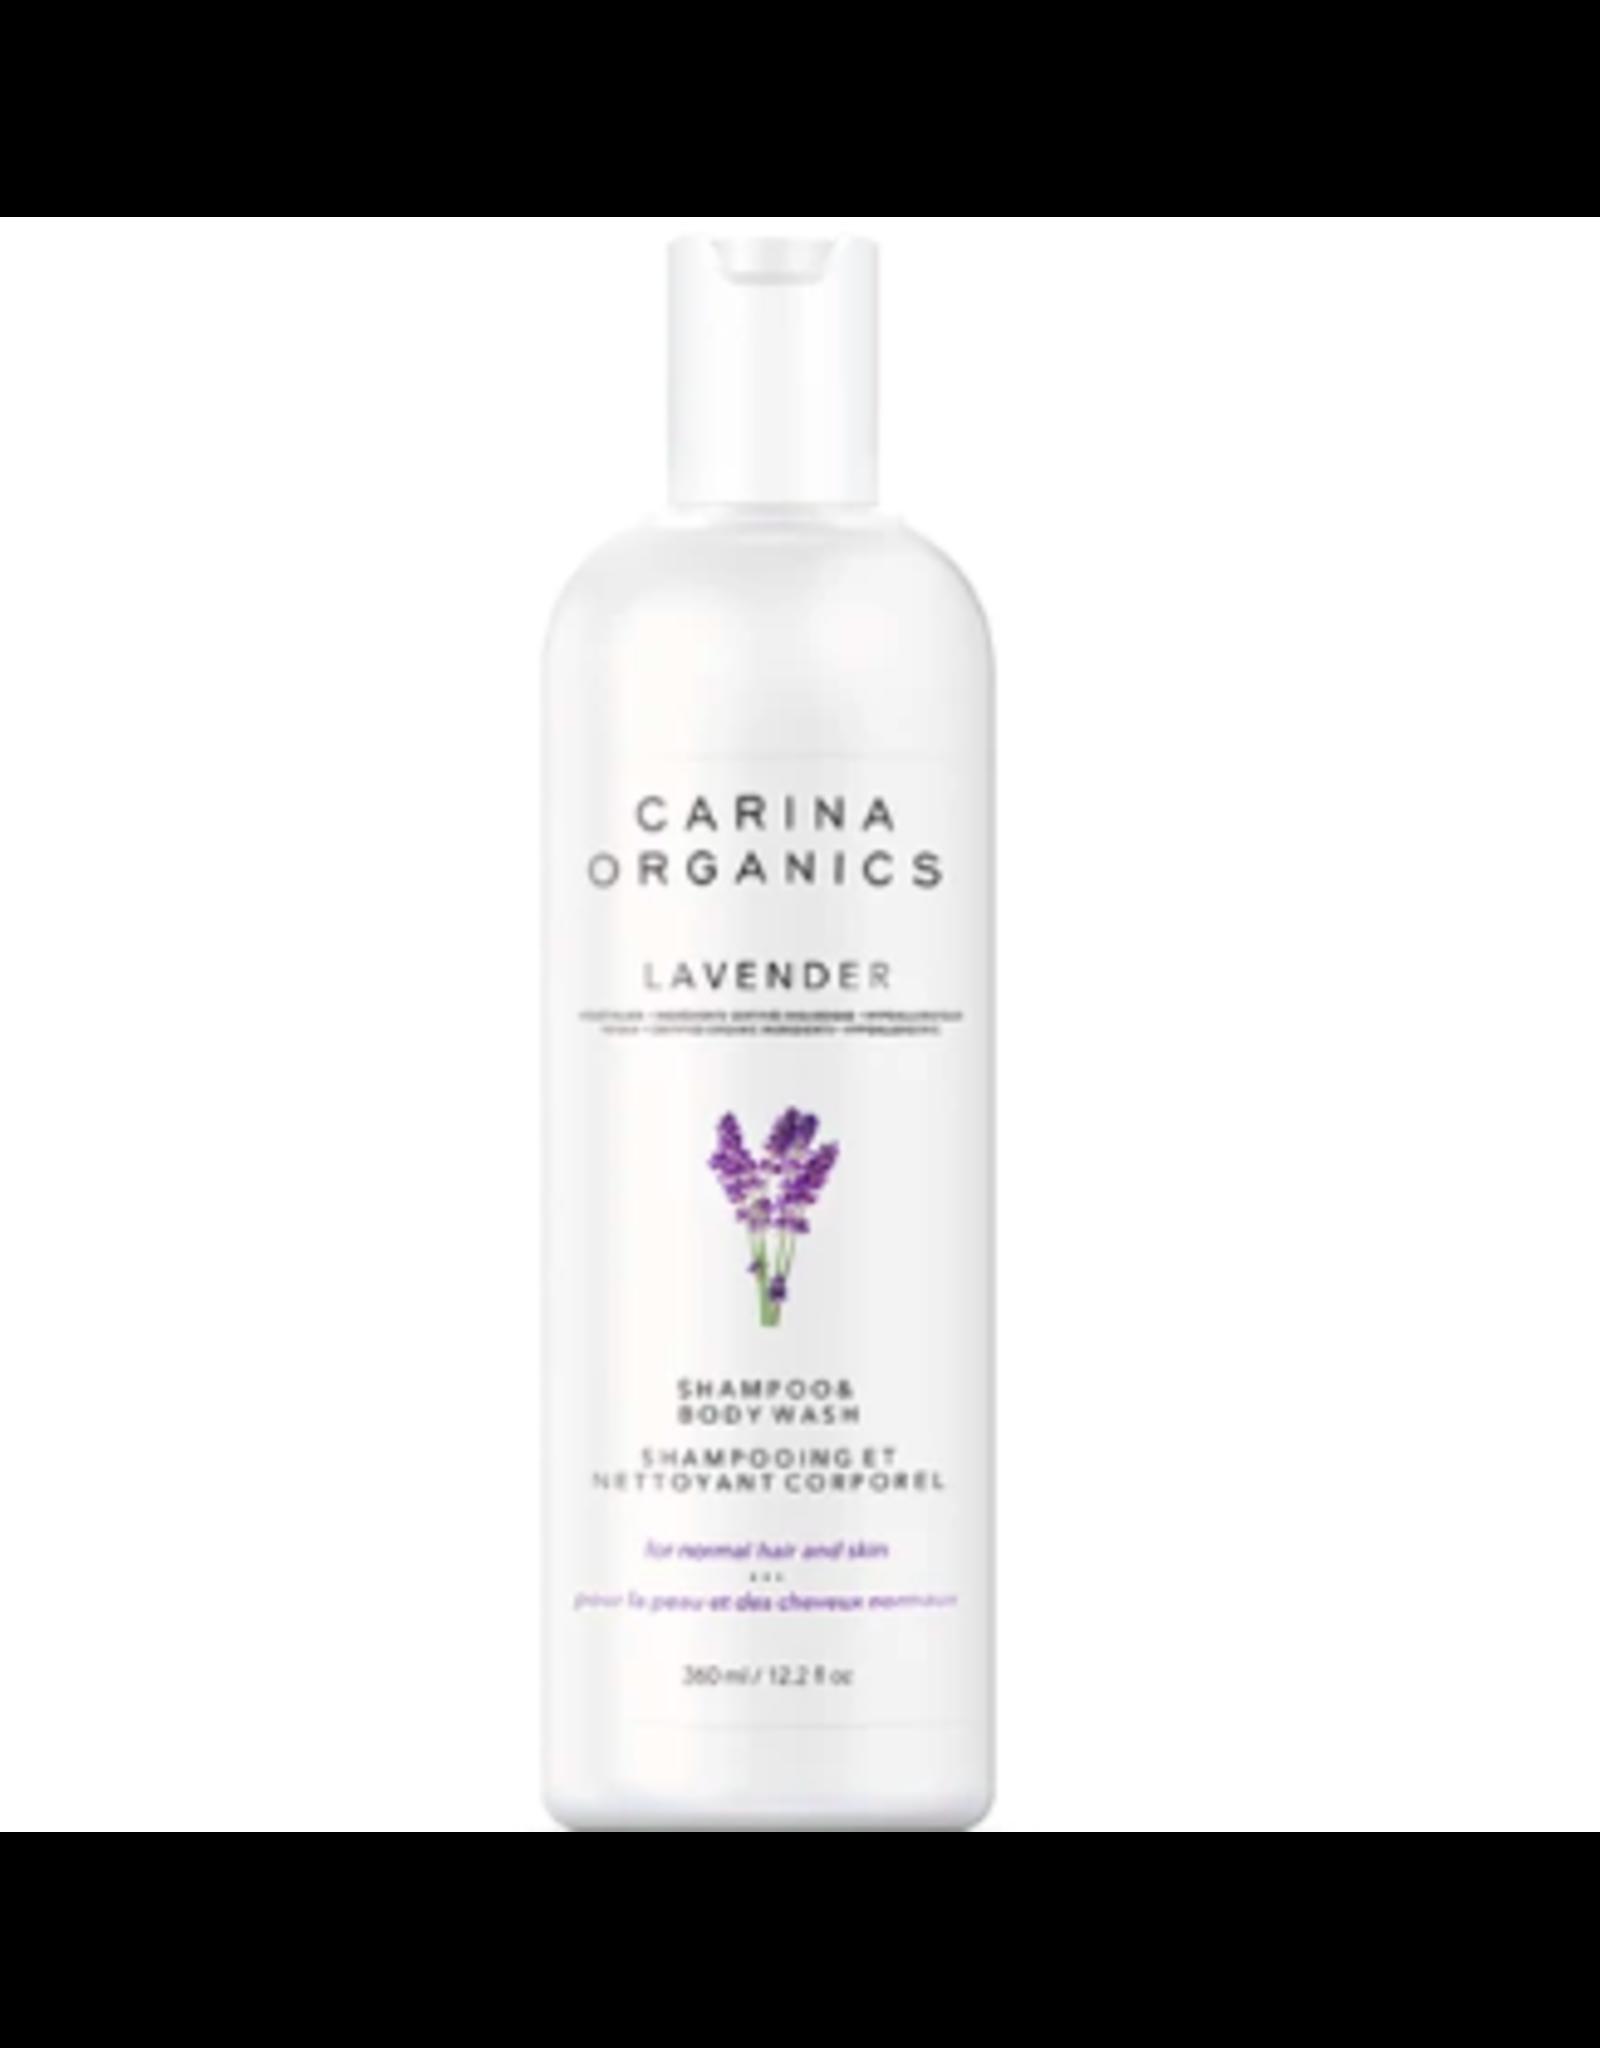 Carina Organics Lavender Shampoo and Body Wash